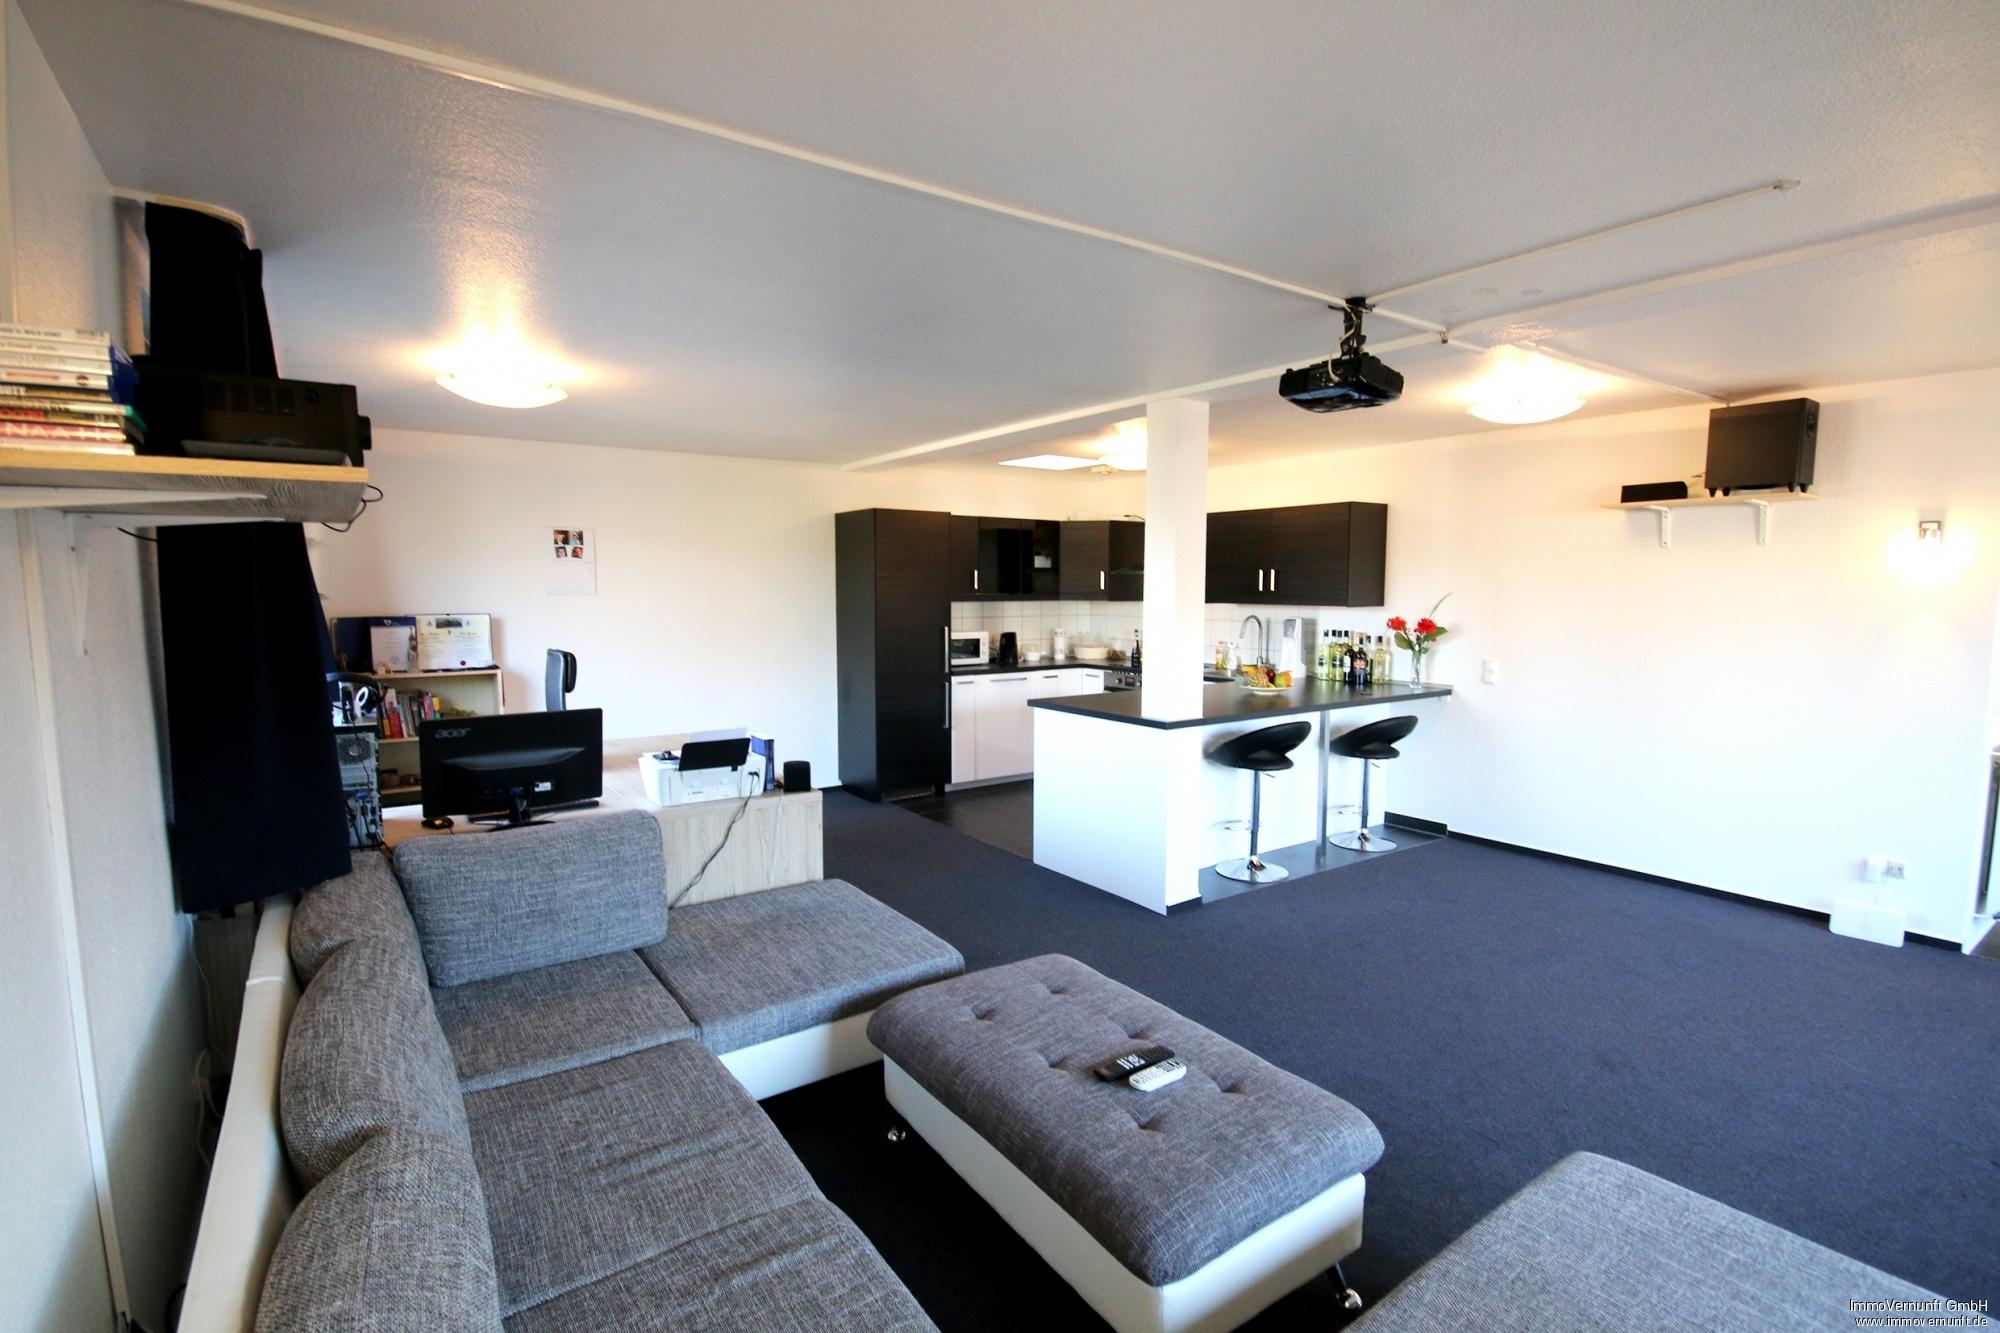 penthousewohnung in oberhausen, 155.000 euro, 98 m², Wohnzimmer dekoo